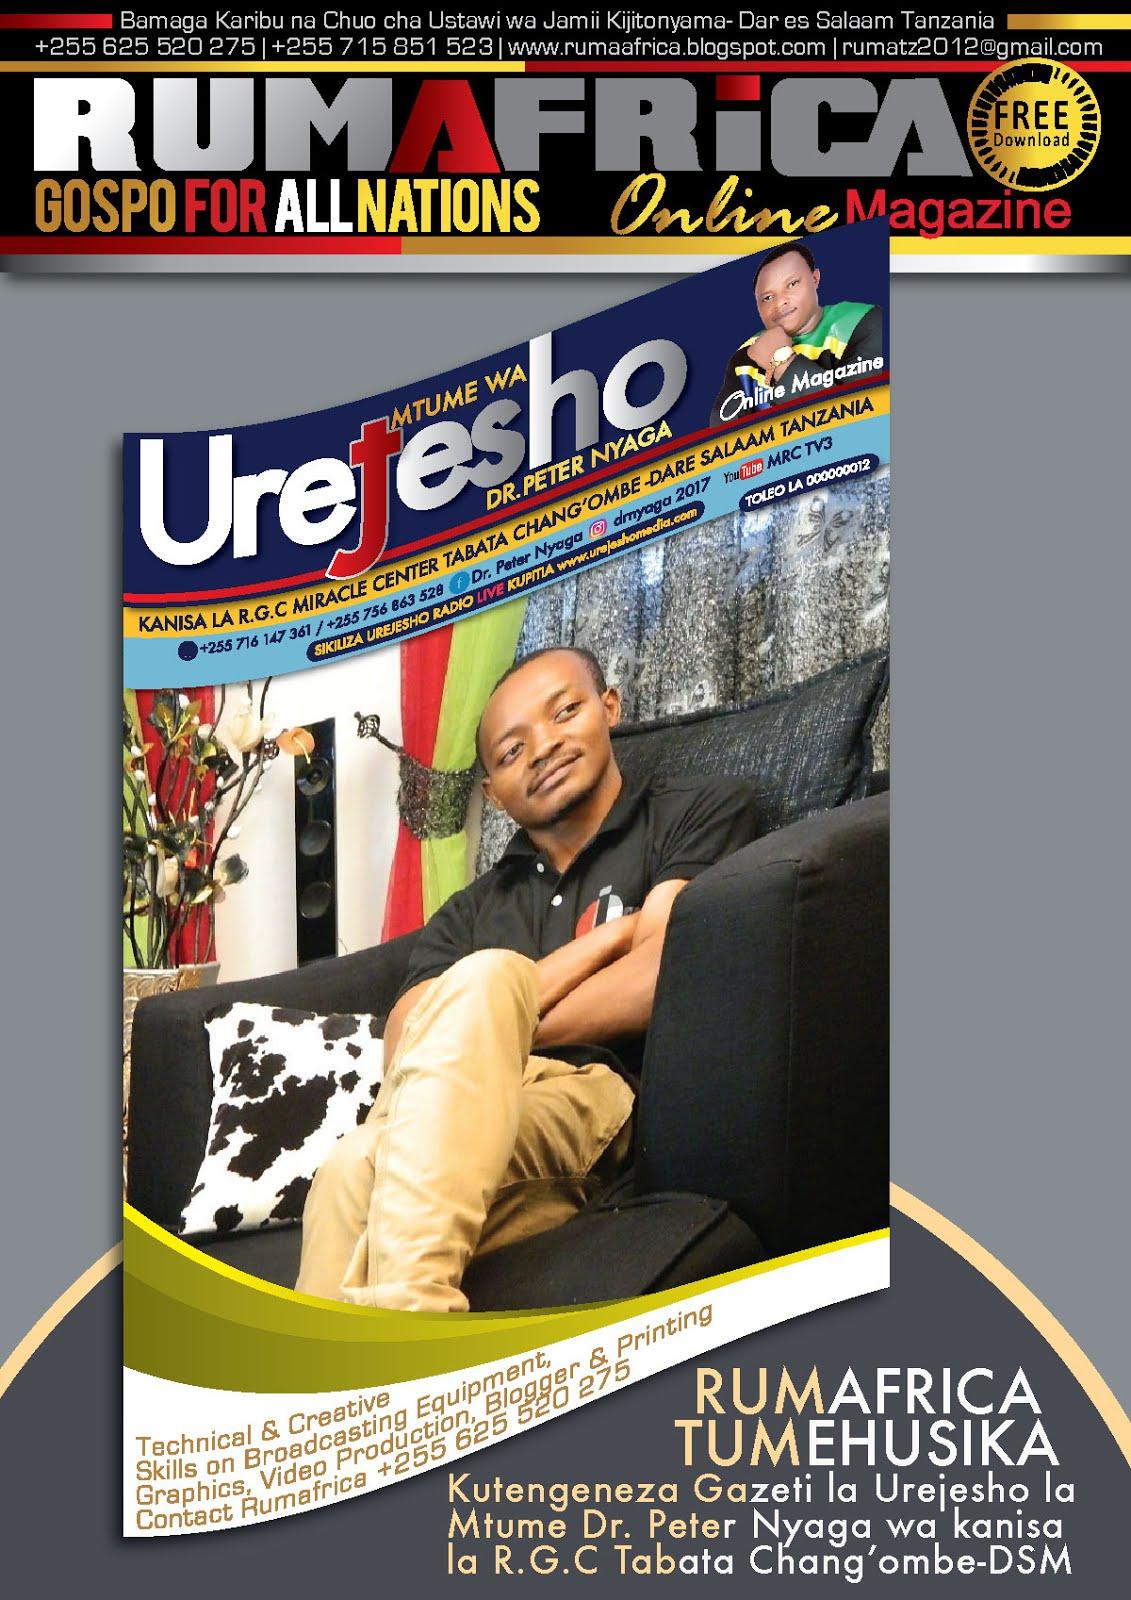 UREJESHO Magazine